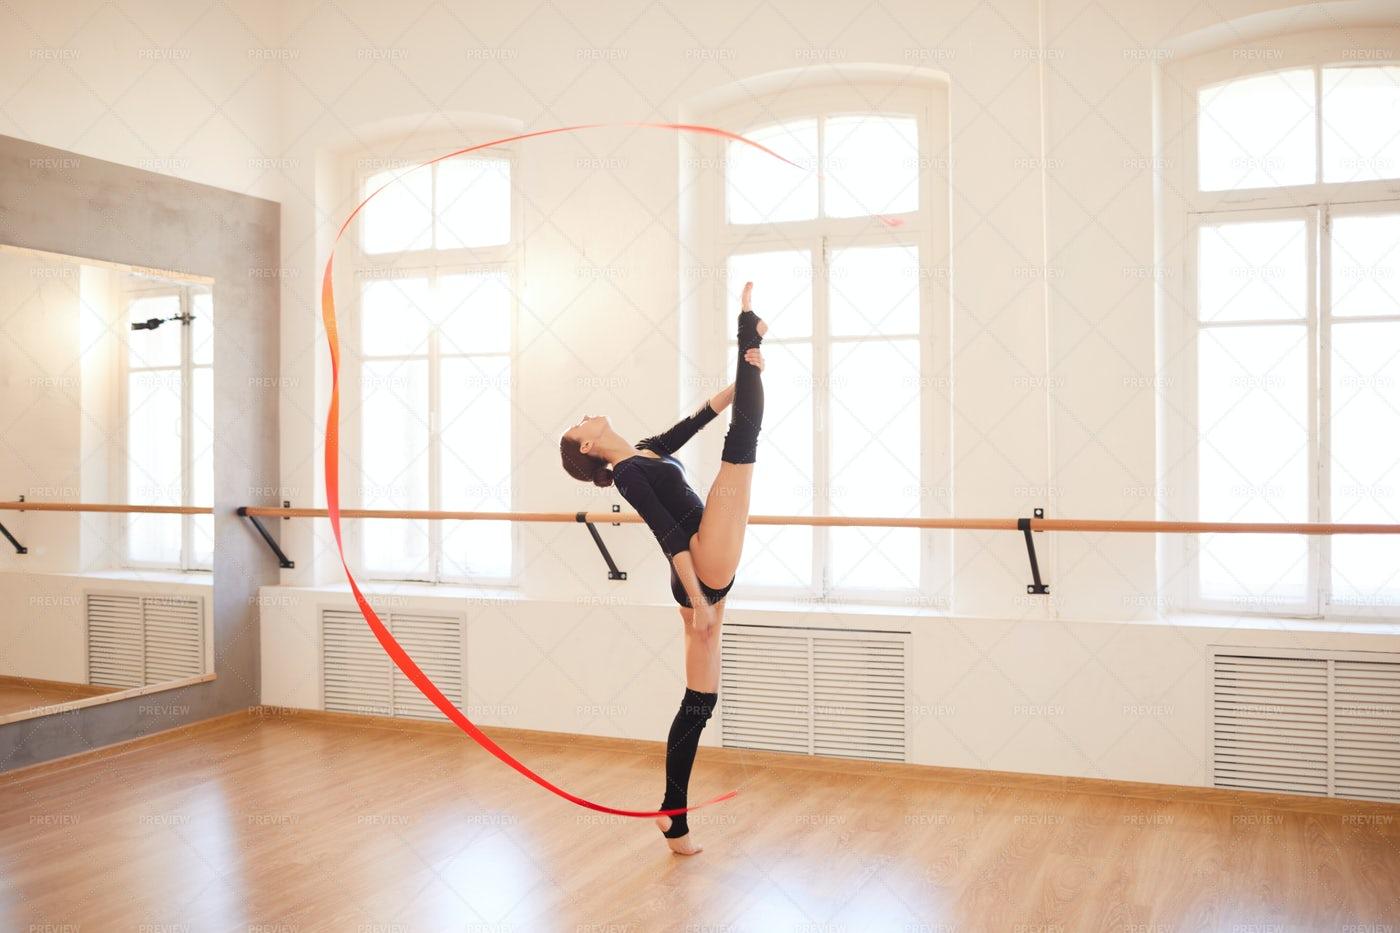 Flexible Girl Performing With...: Stock Photos